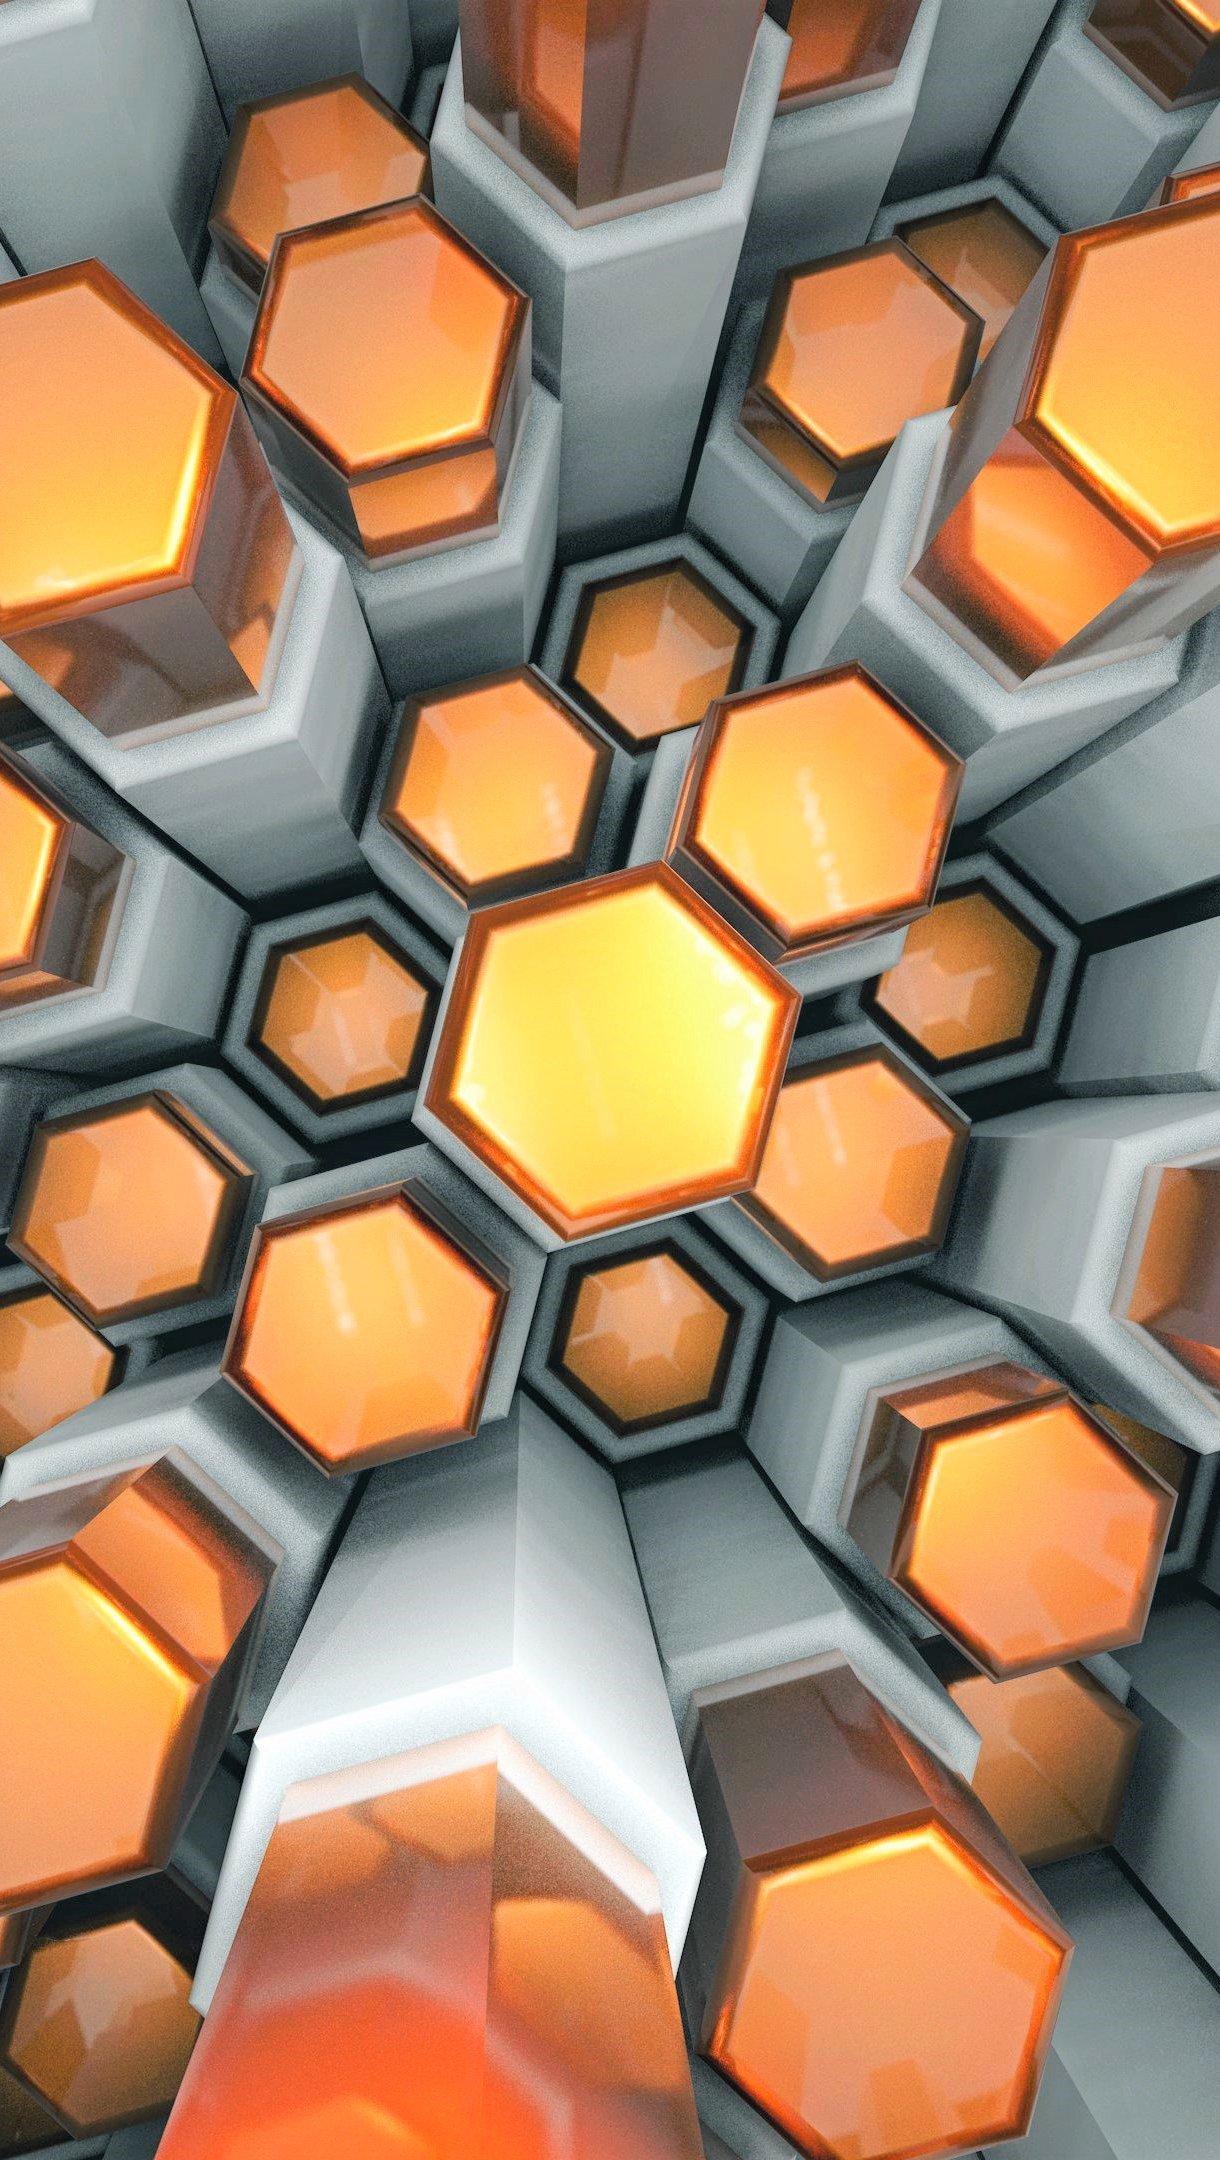 Wallpaper Texture of hexagons Vertical